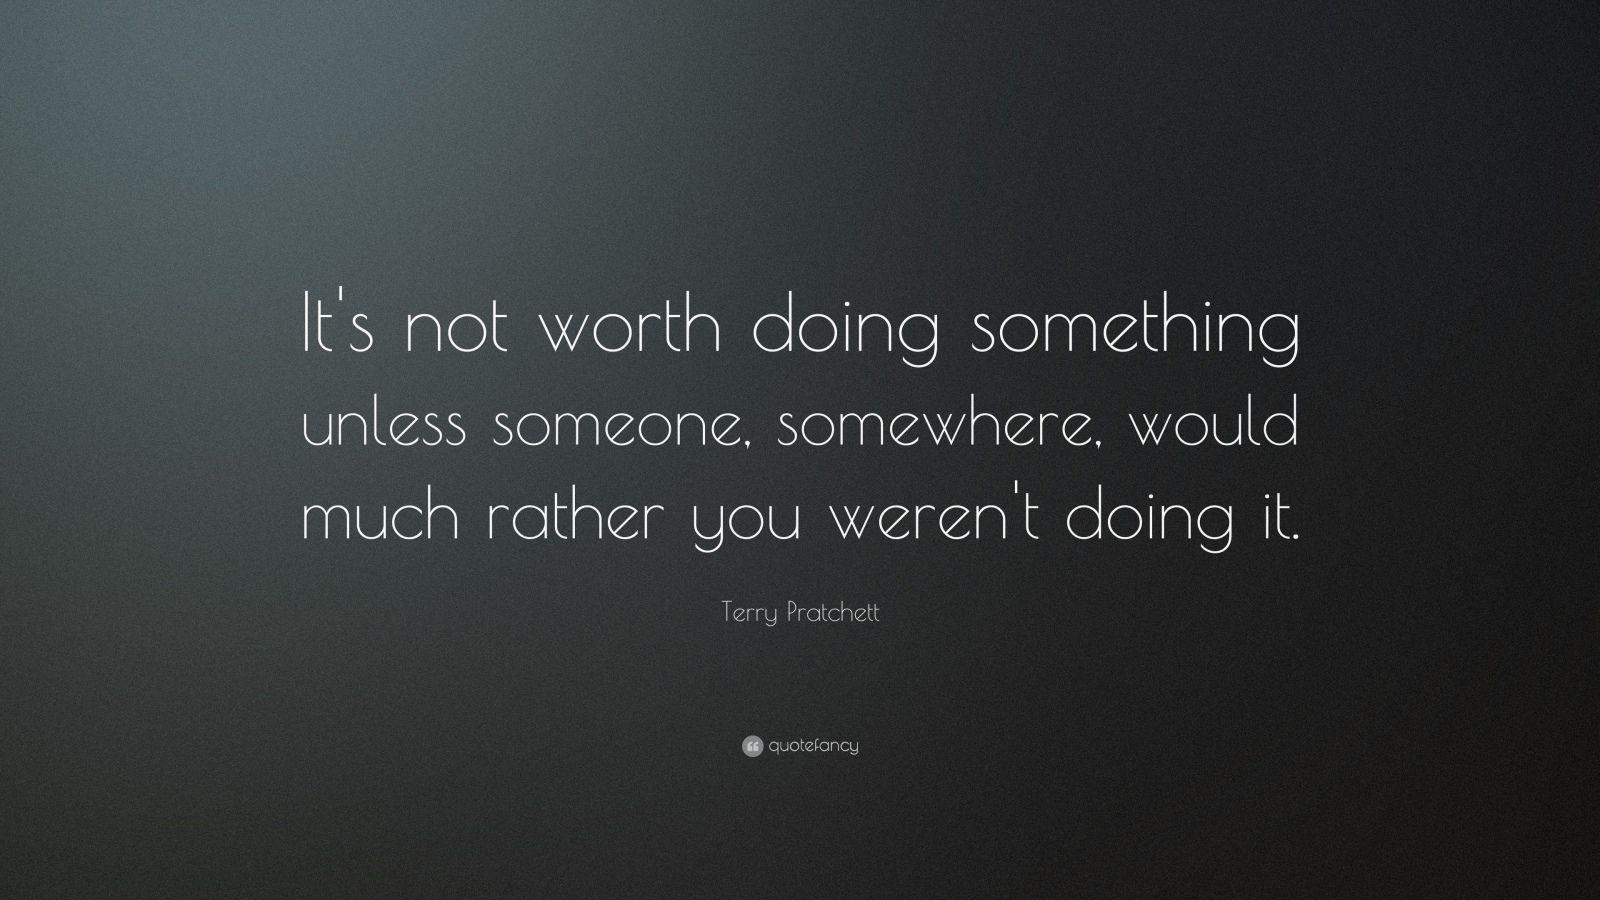 Terry Pratchett Quotes Wallpapers   Inspirational e quotescom 1600x900